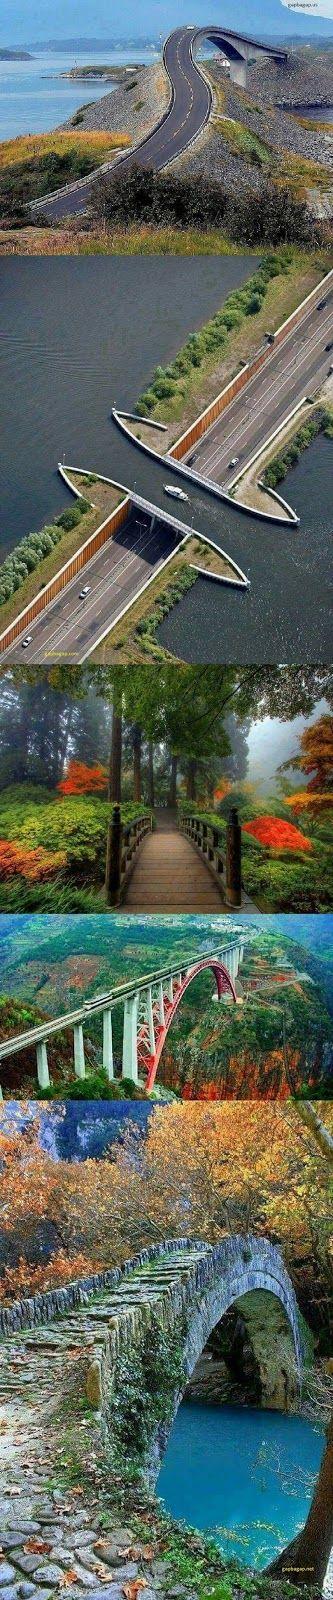 Top 5 Amazing Pictures Of Bridges